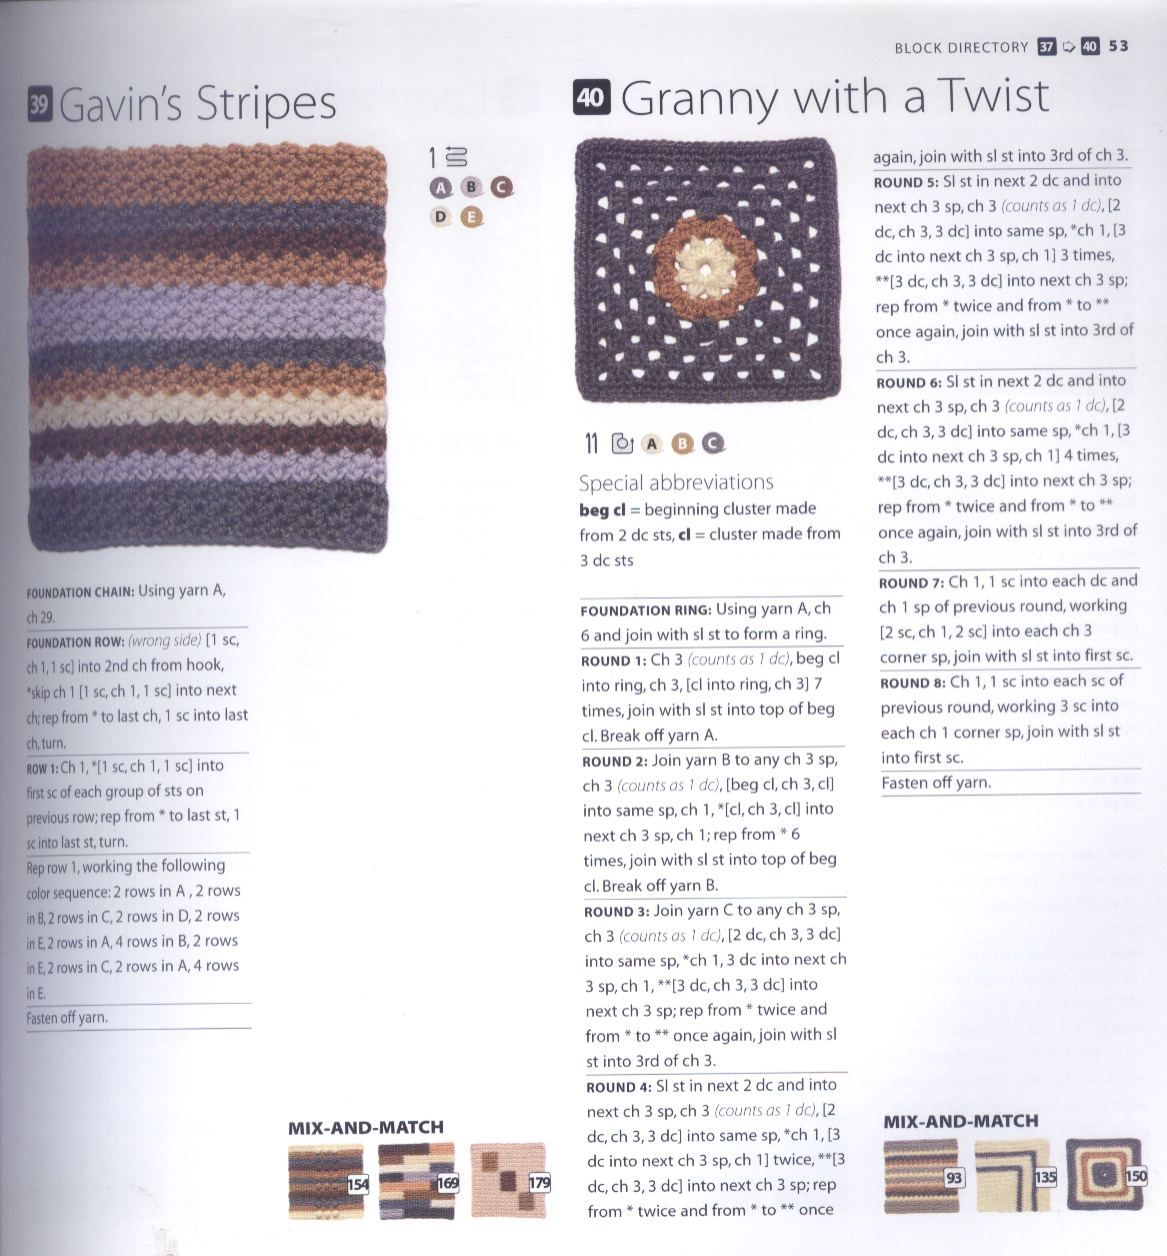 200 Crocheted Blocks for blankets, throws & Afghans 053